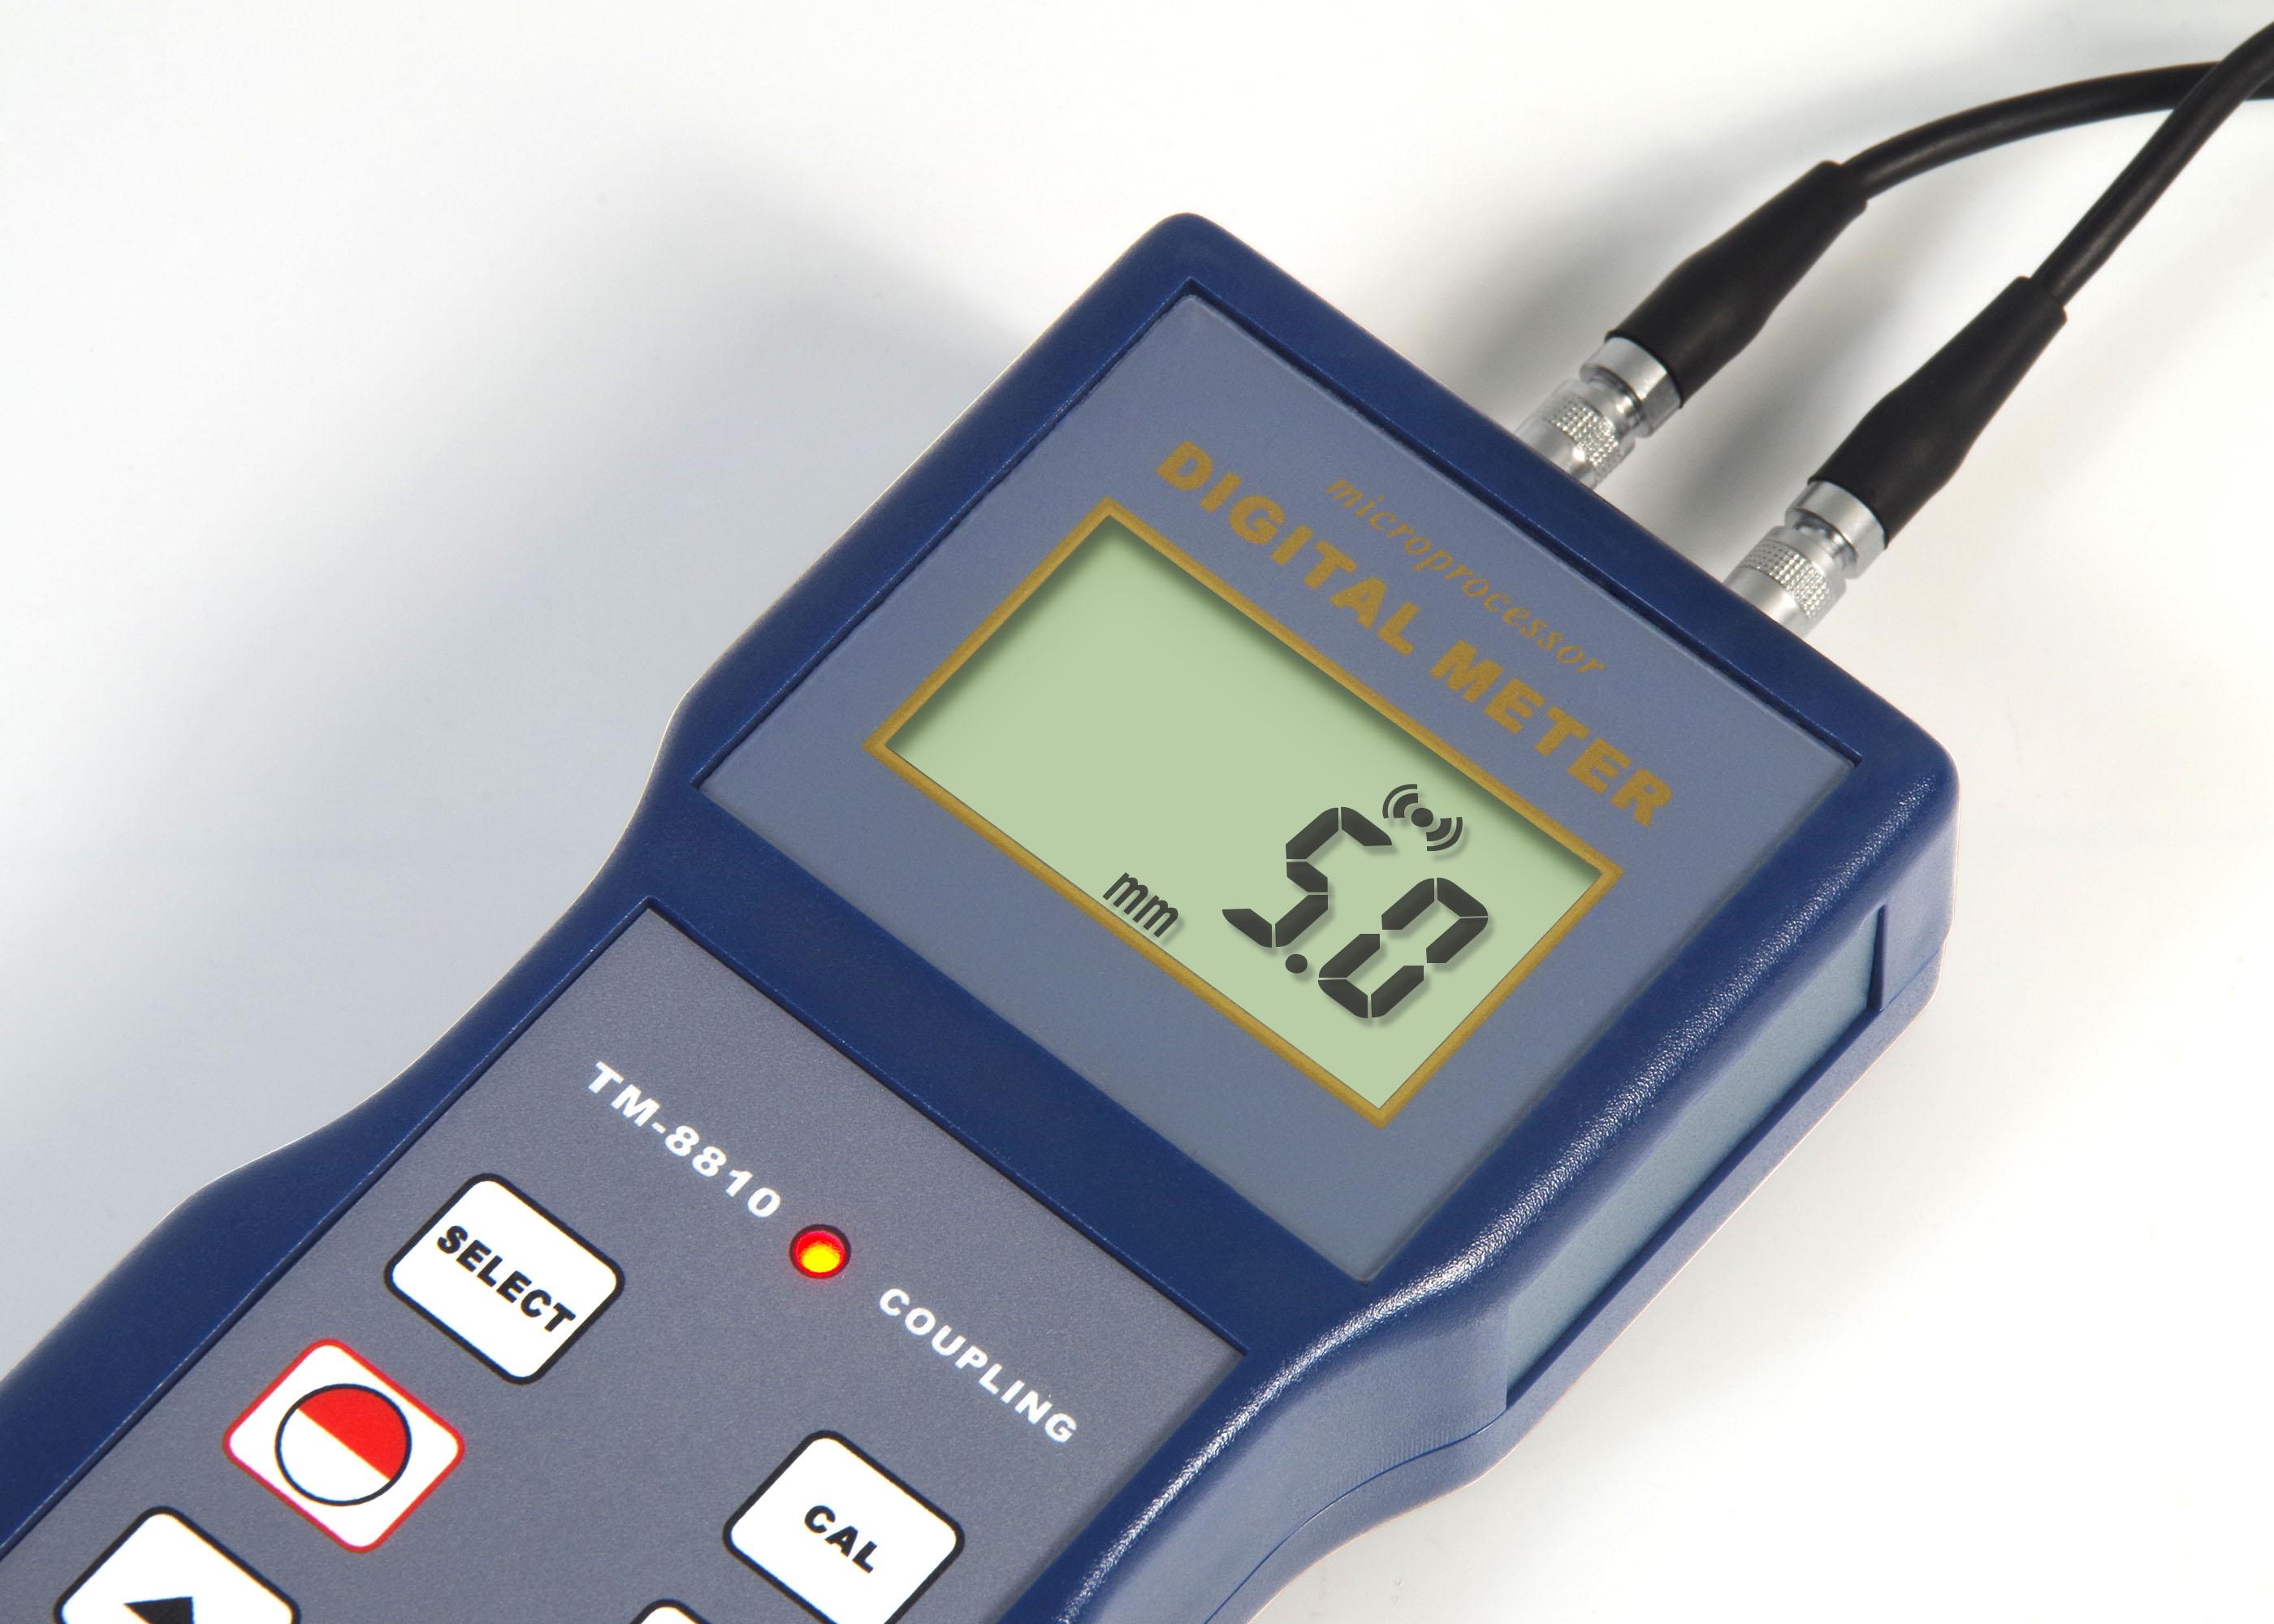 LANDTEK Ultrasonic Thickness Gauge Measure Thickness & Corrosion 1.2 - 200mm TM8810